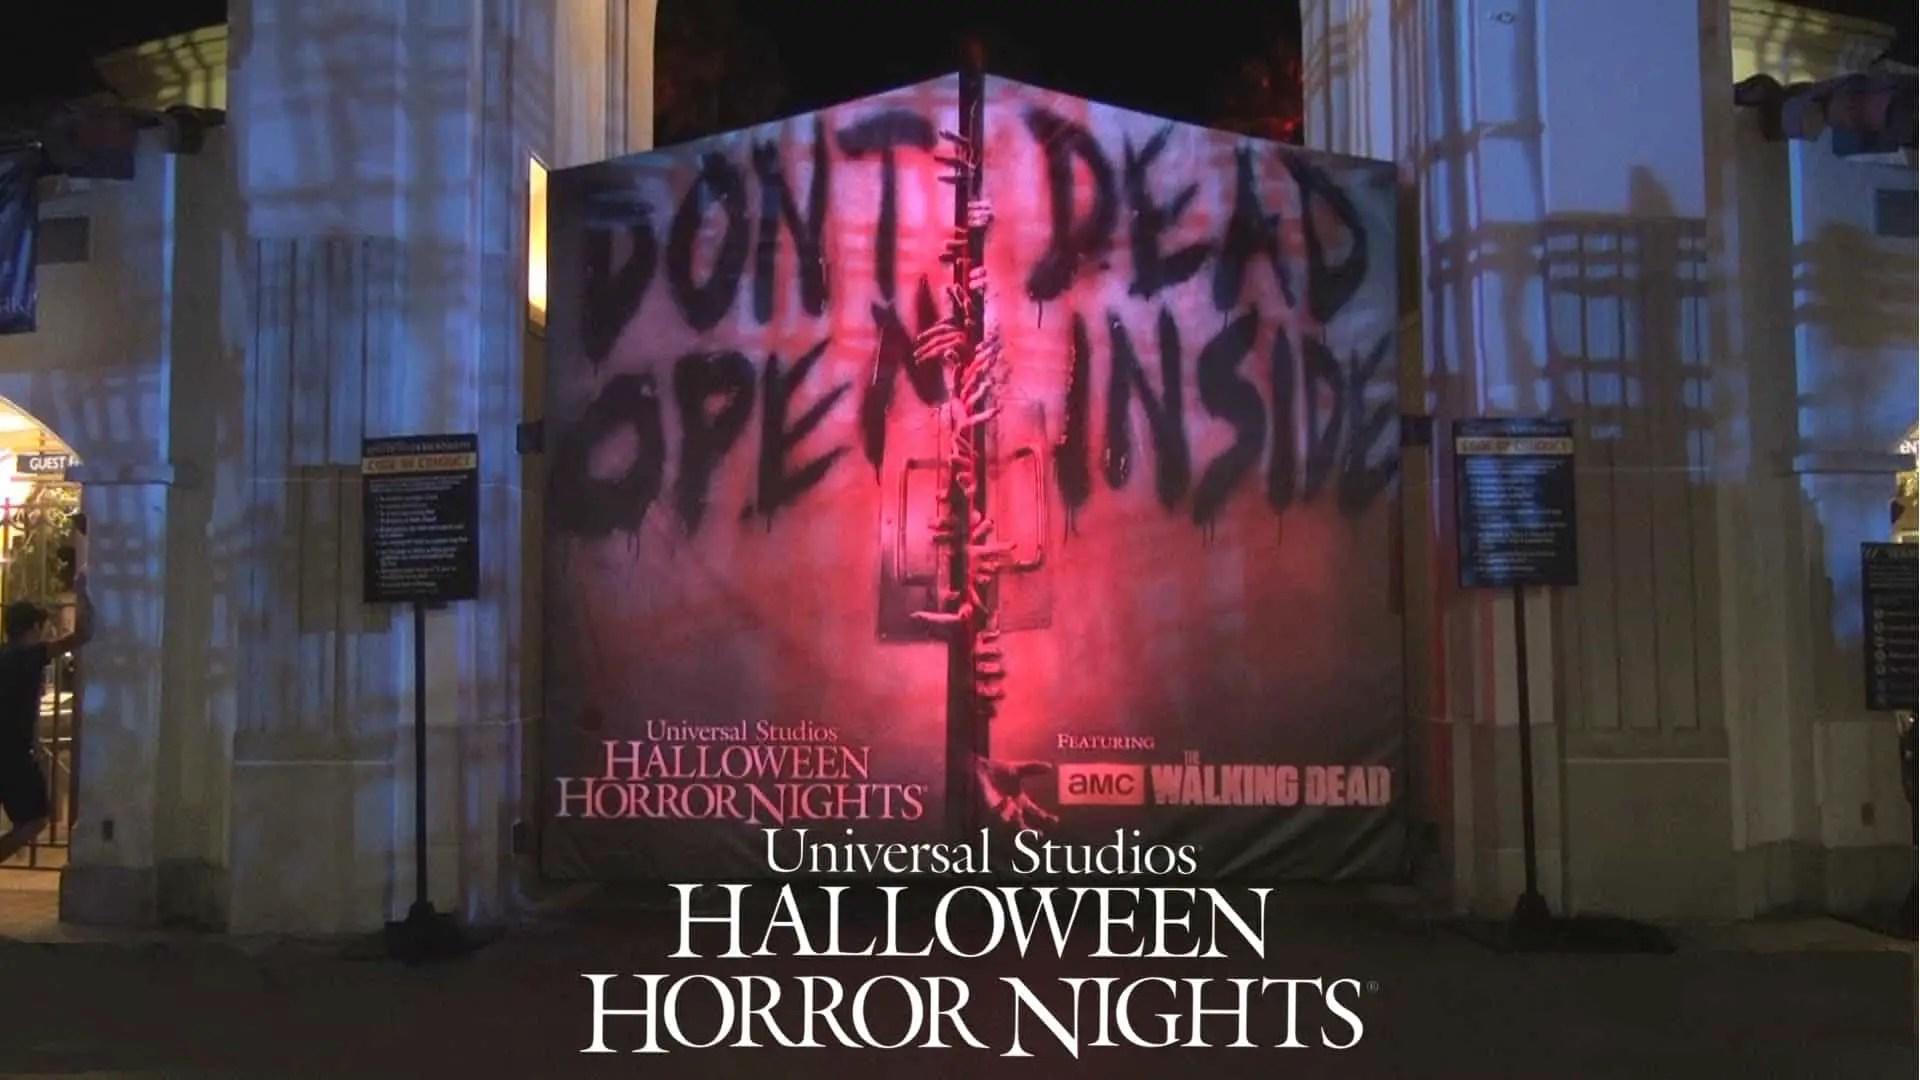 Universal Studio's Halloween Horror Nights - Haunting